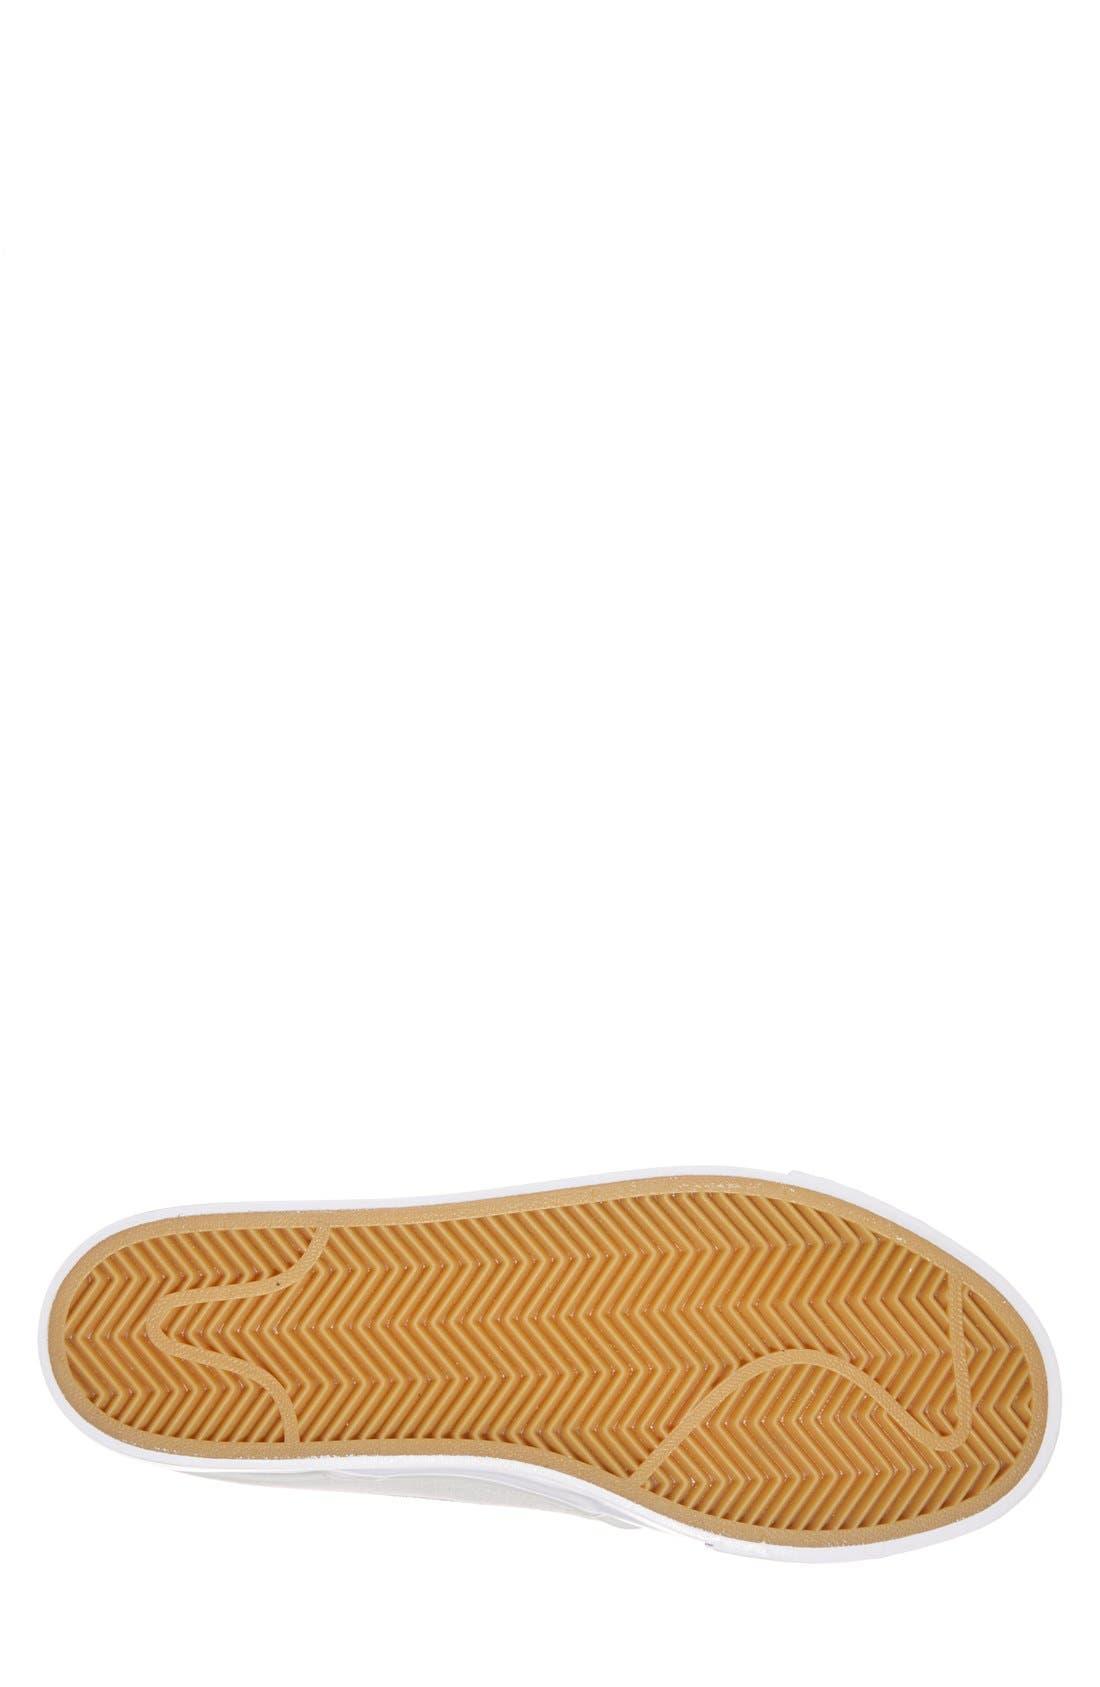 Zoom - Stefan Janoski SB Canvas Skate Shoe,                             Alternate thumbnail 148, color,